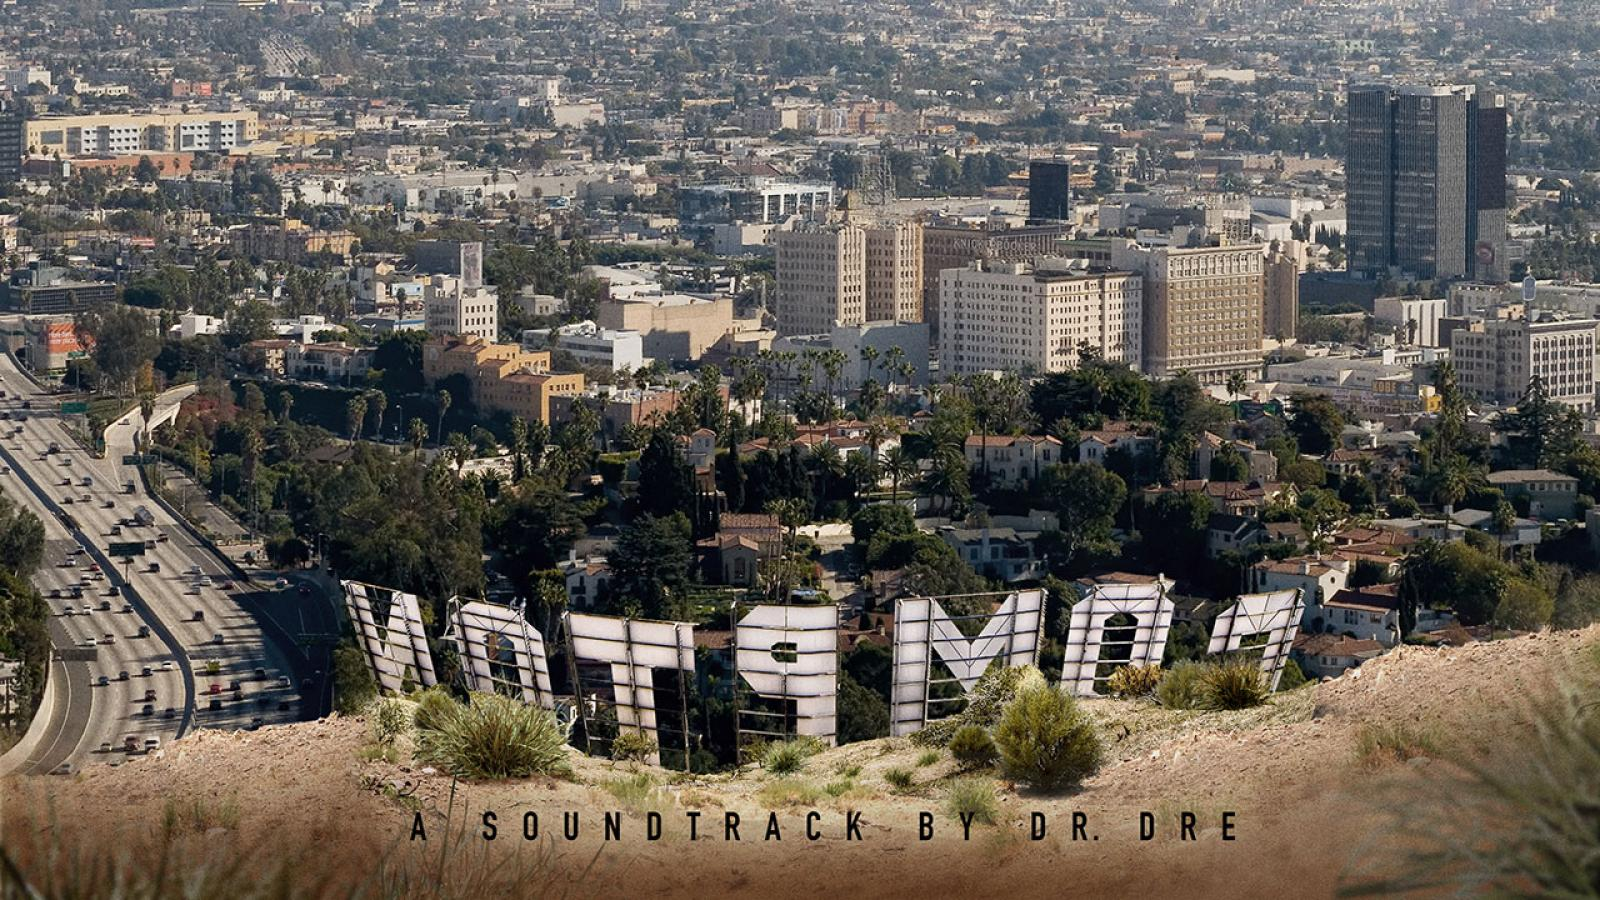 Dr Dre Compton